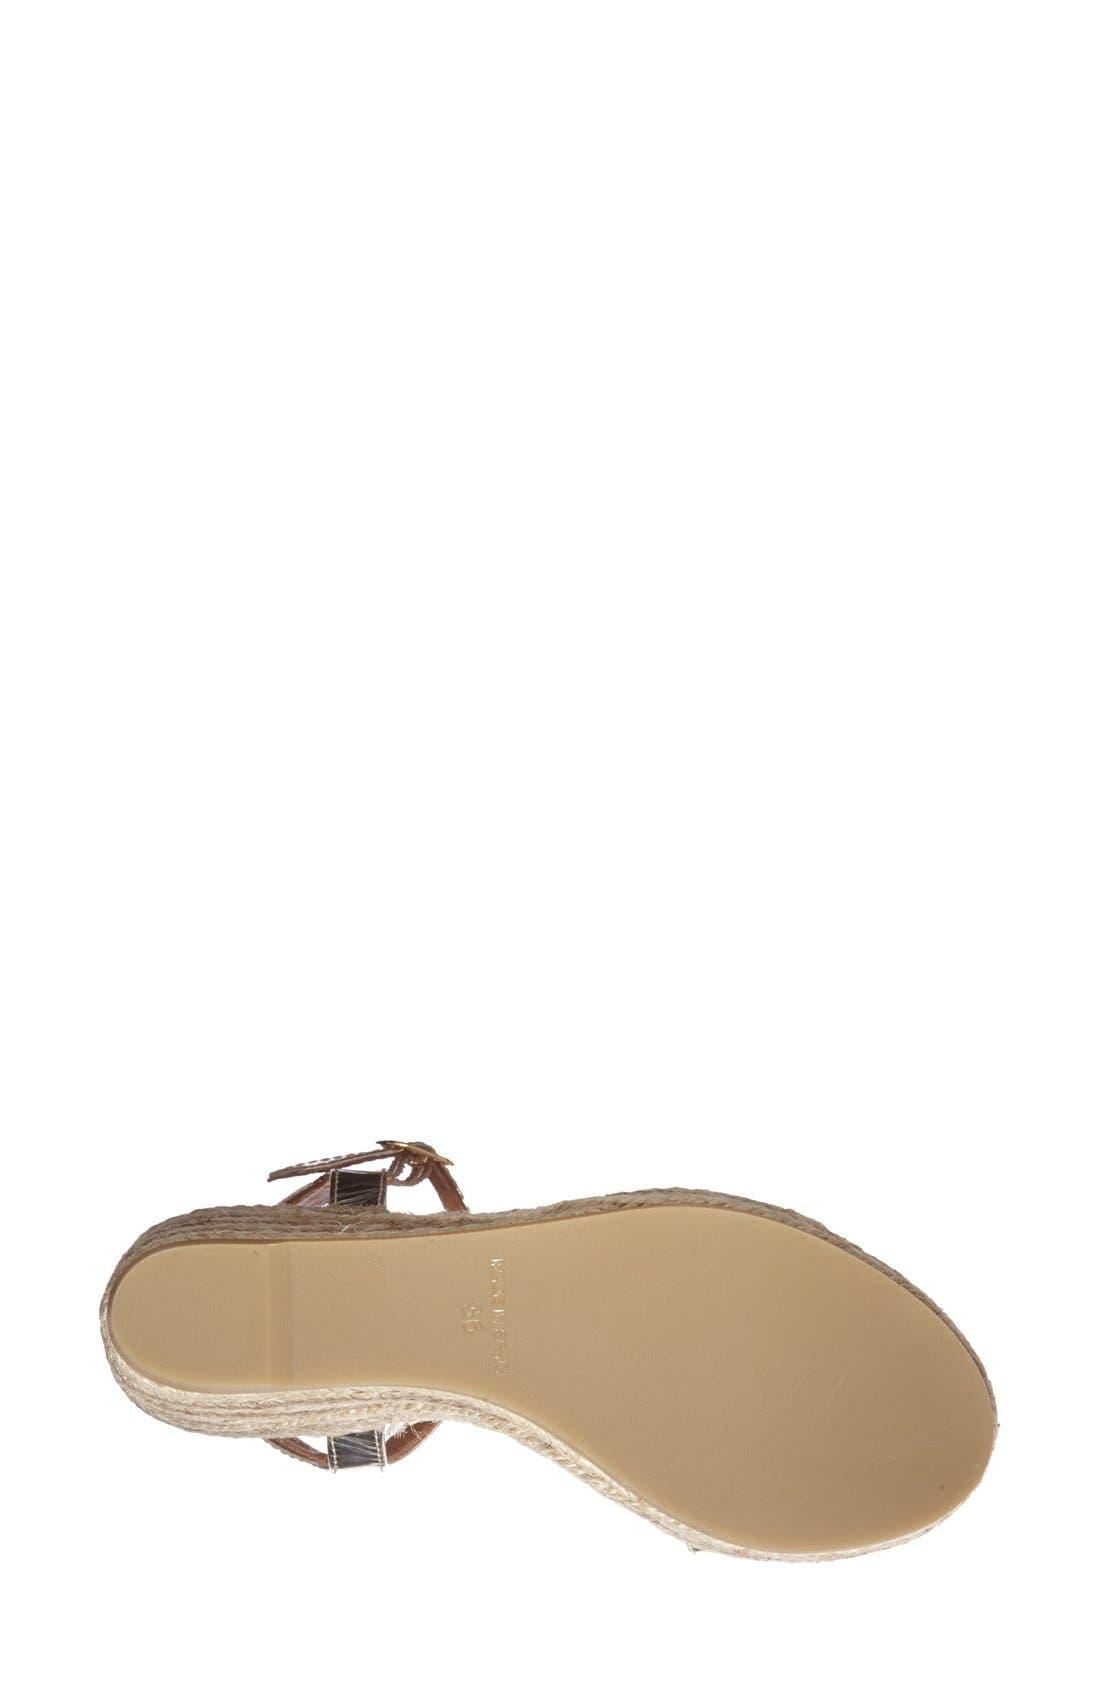 Alternate Image 4  - André Assous 'Brasilia' Ankle Strap Espadrille Sandal (Women)